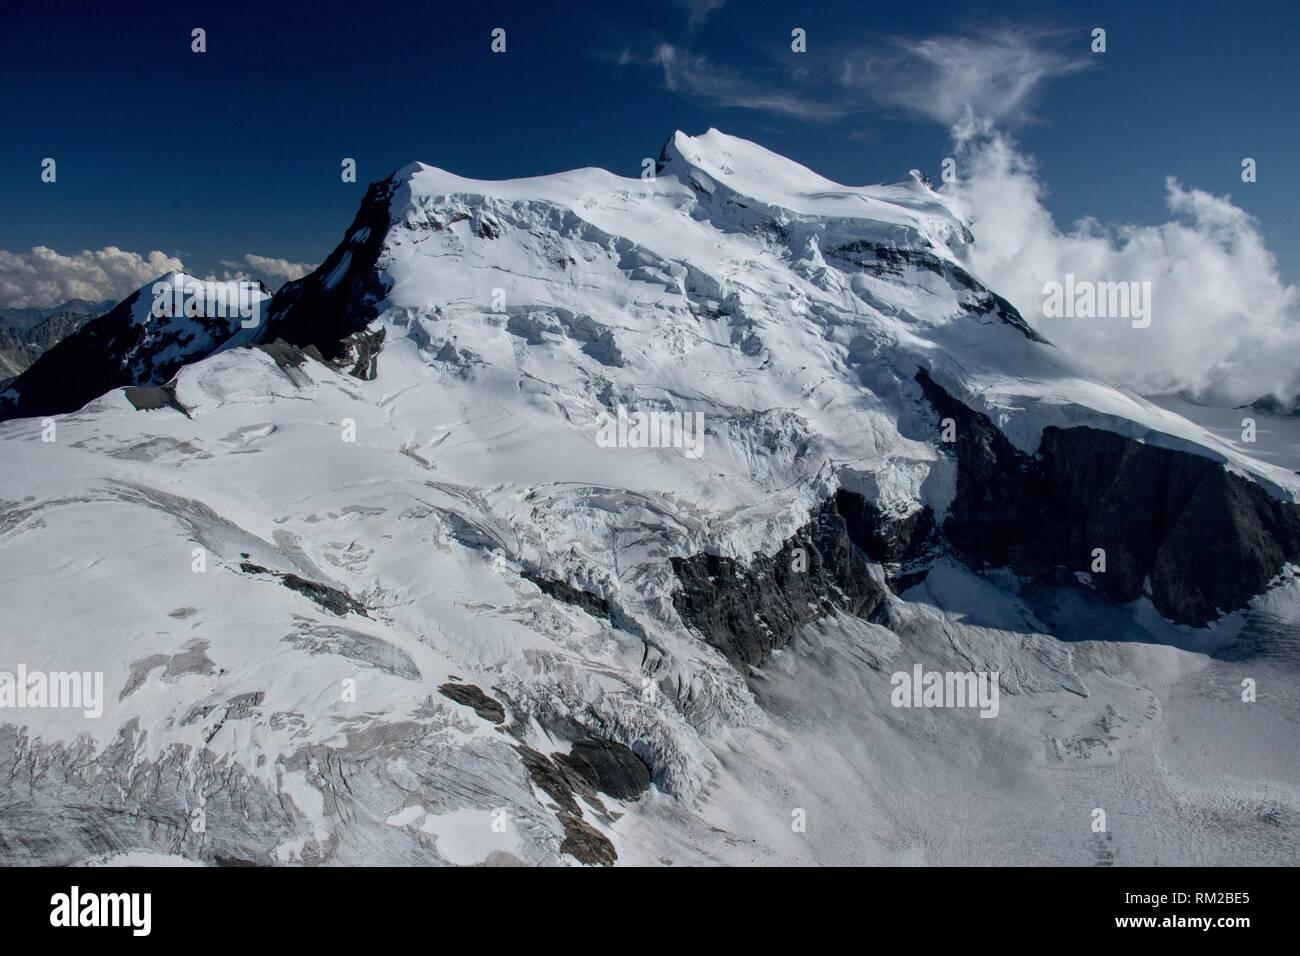 Grand Combin, Switzerland - Aerial - Stock Image